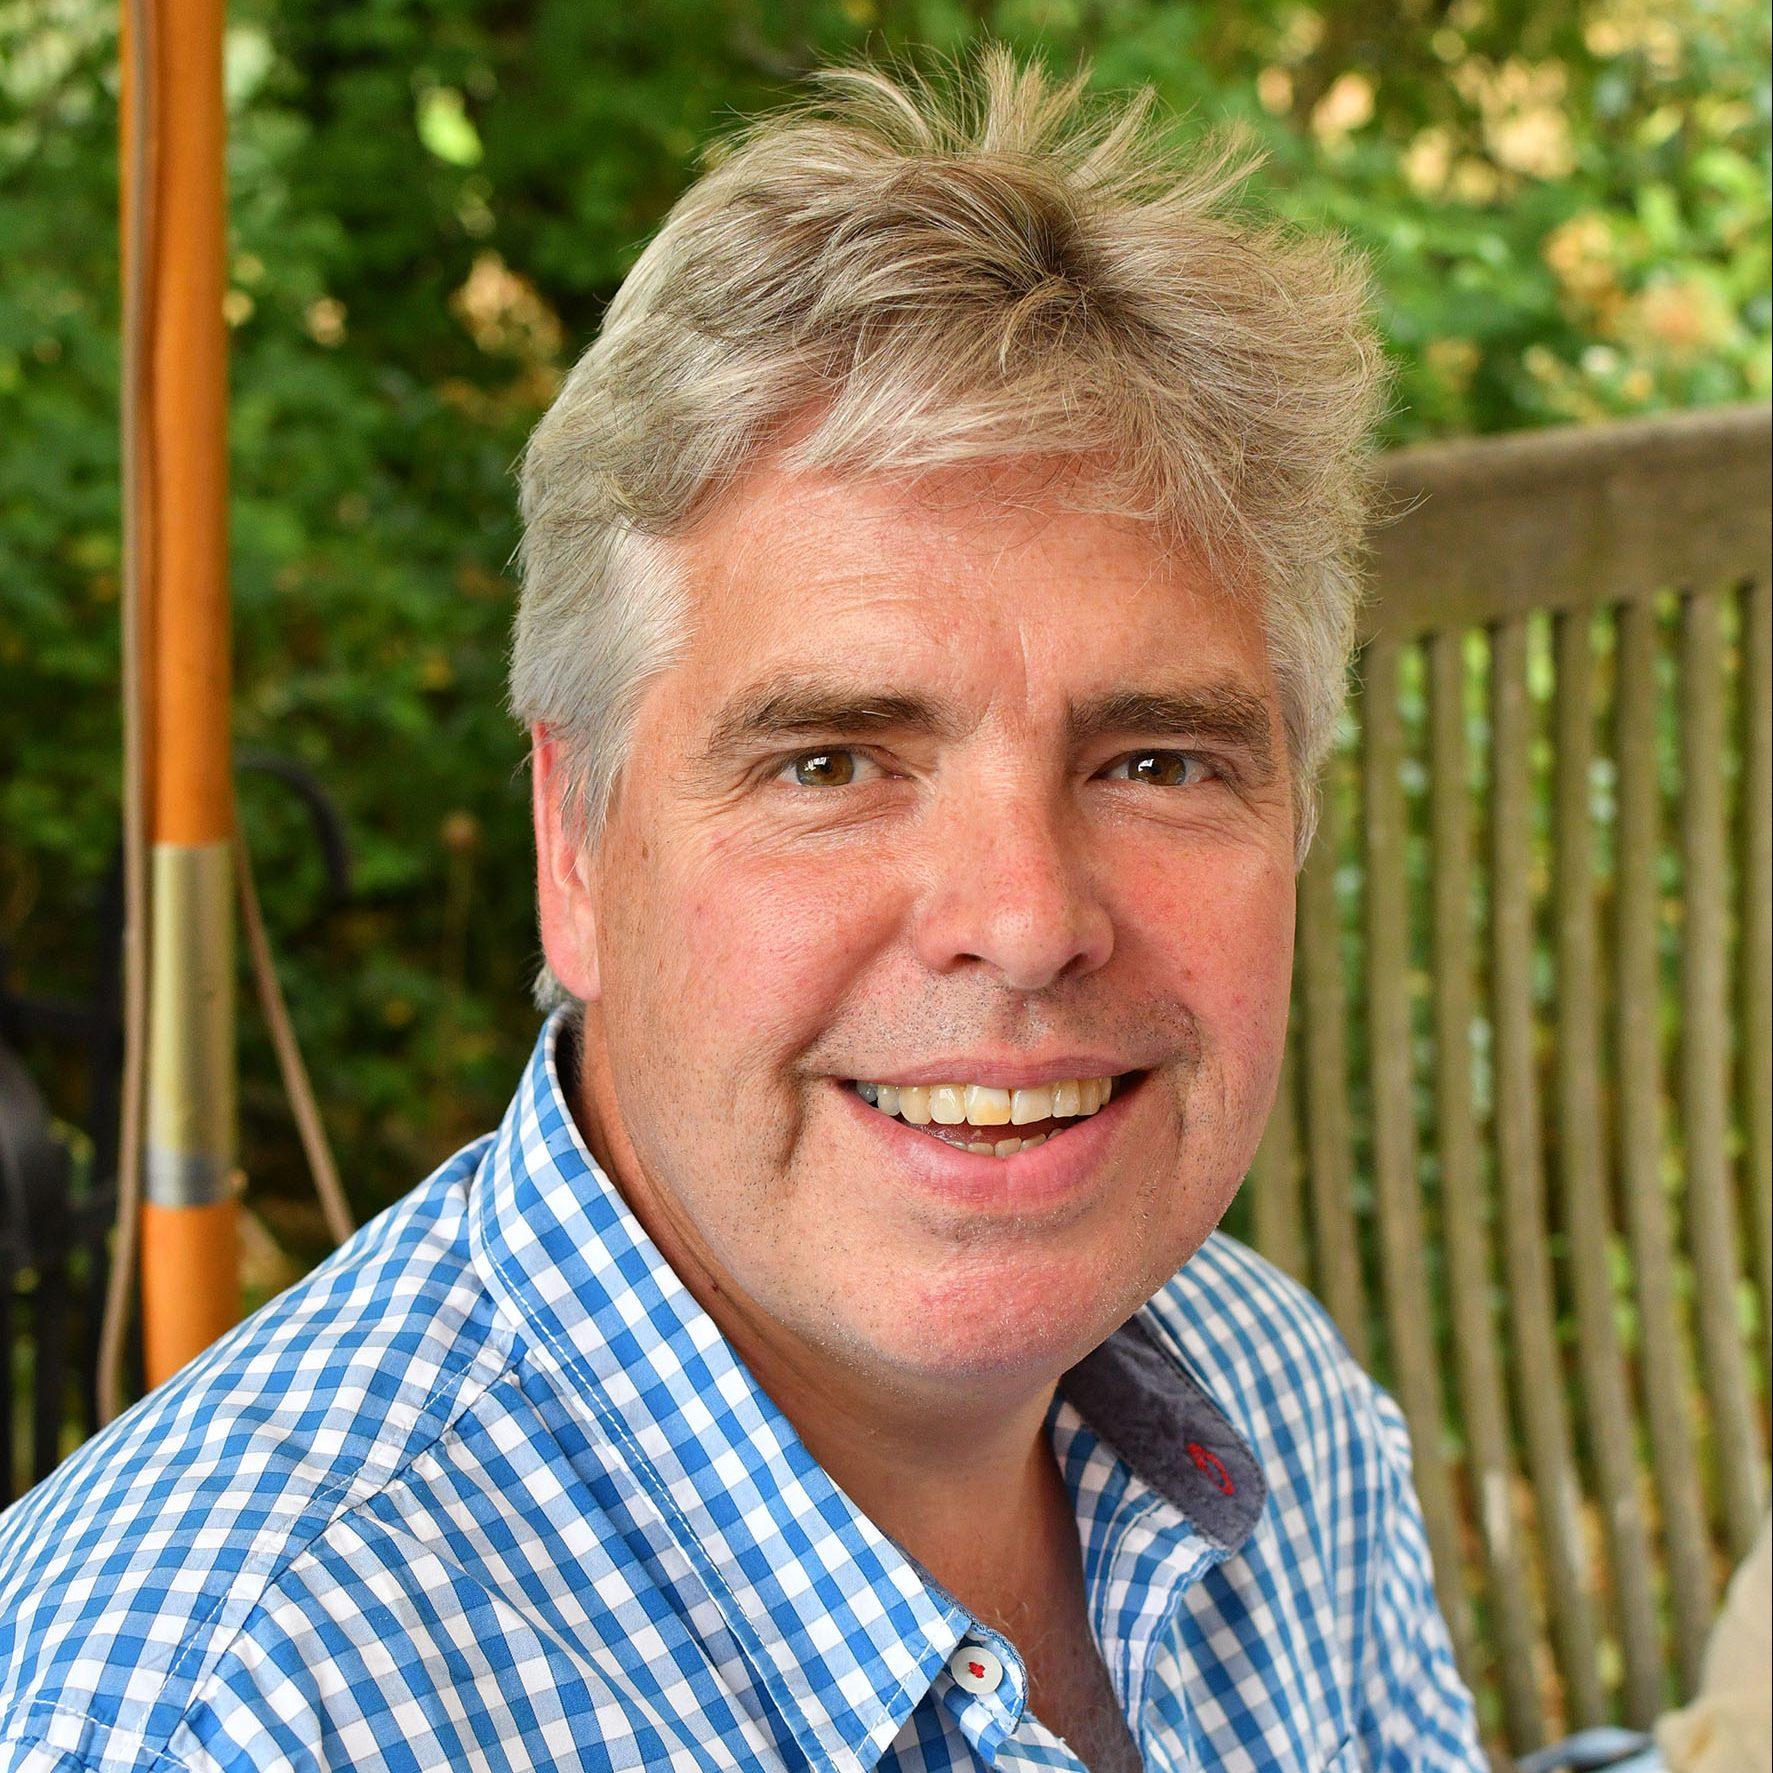 Damian Riley